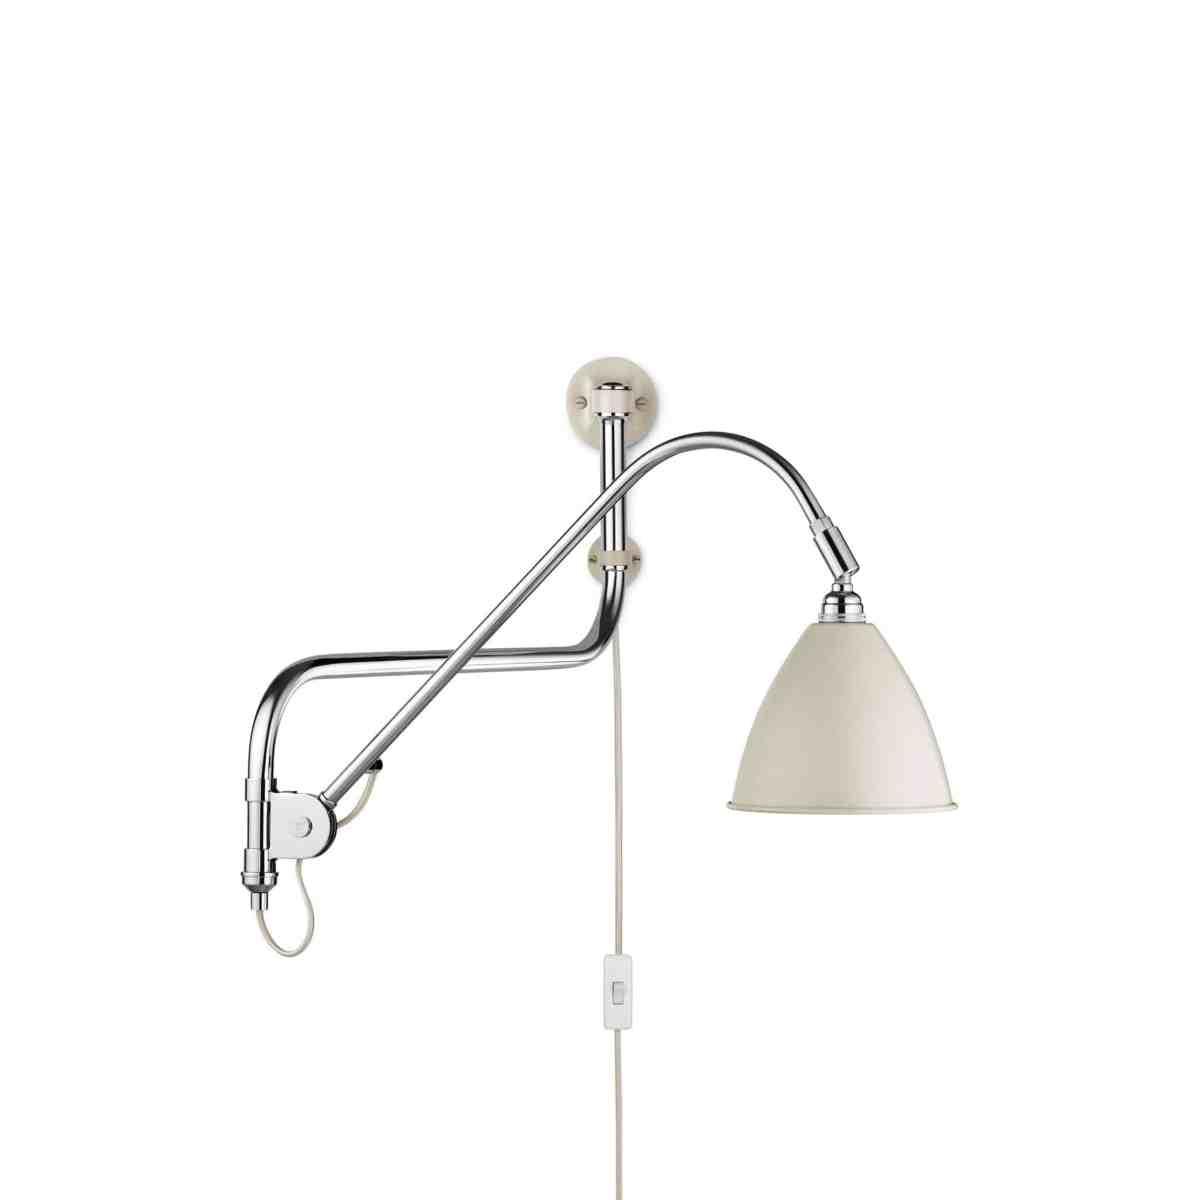 gubi-bestlite-wall-lamp-off-white-001